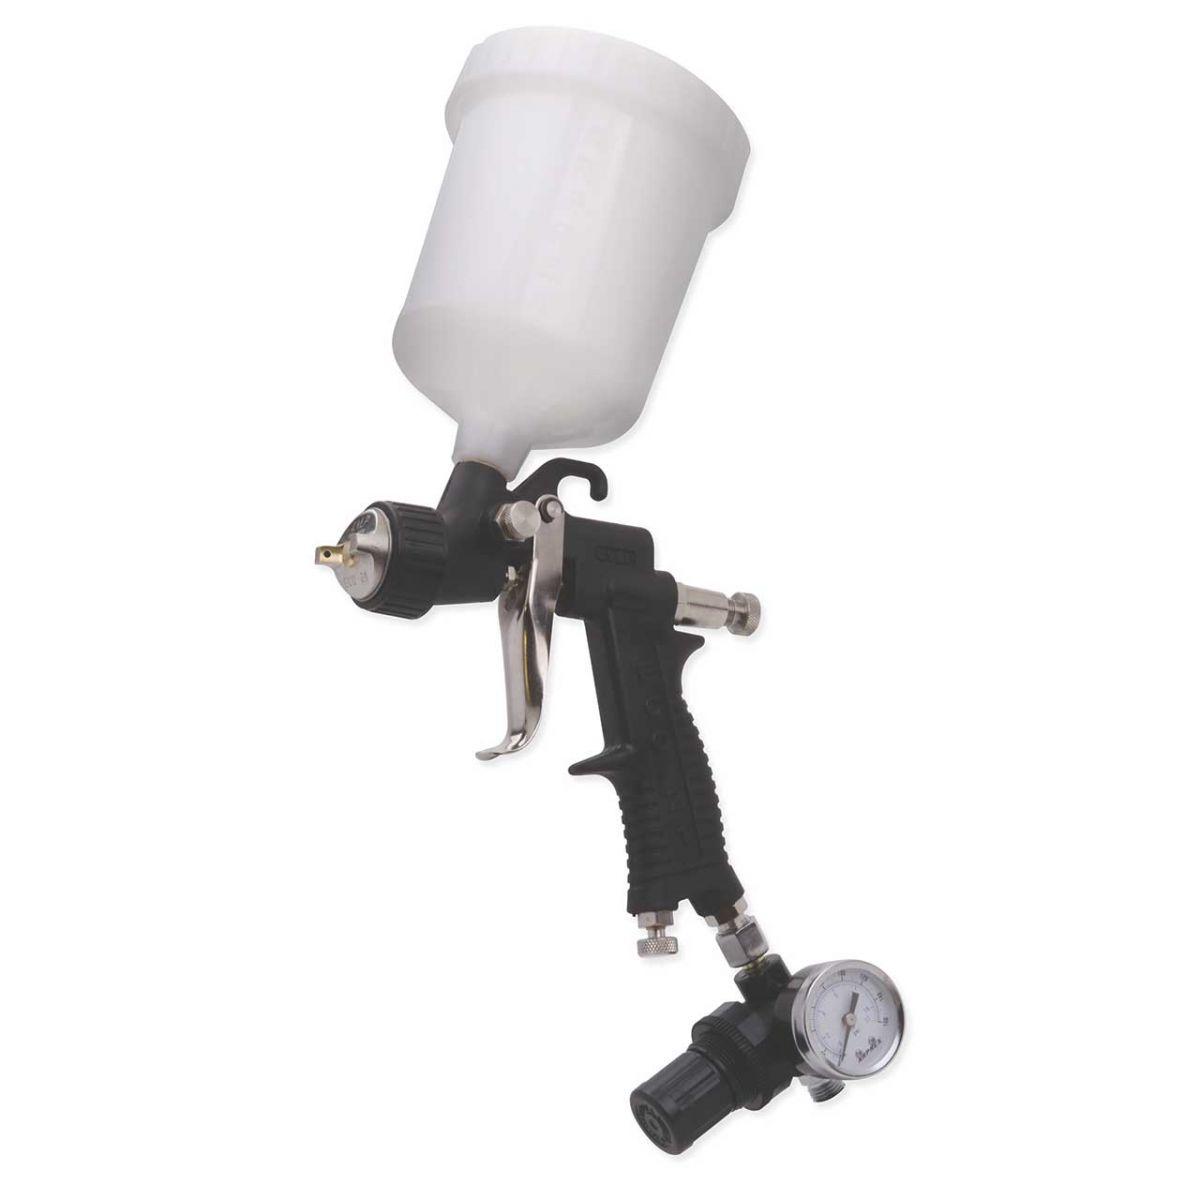 Pistola de Pintura Tipo Gravidade ECO 21 - ARPREX